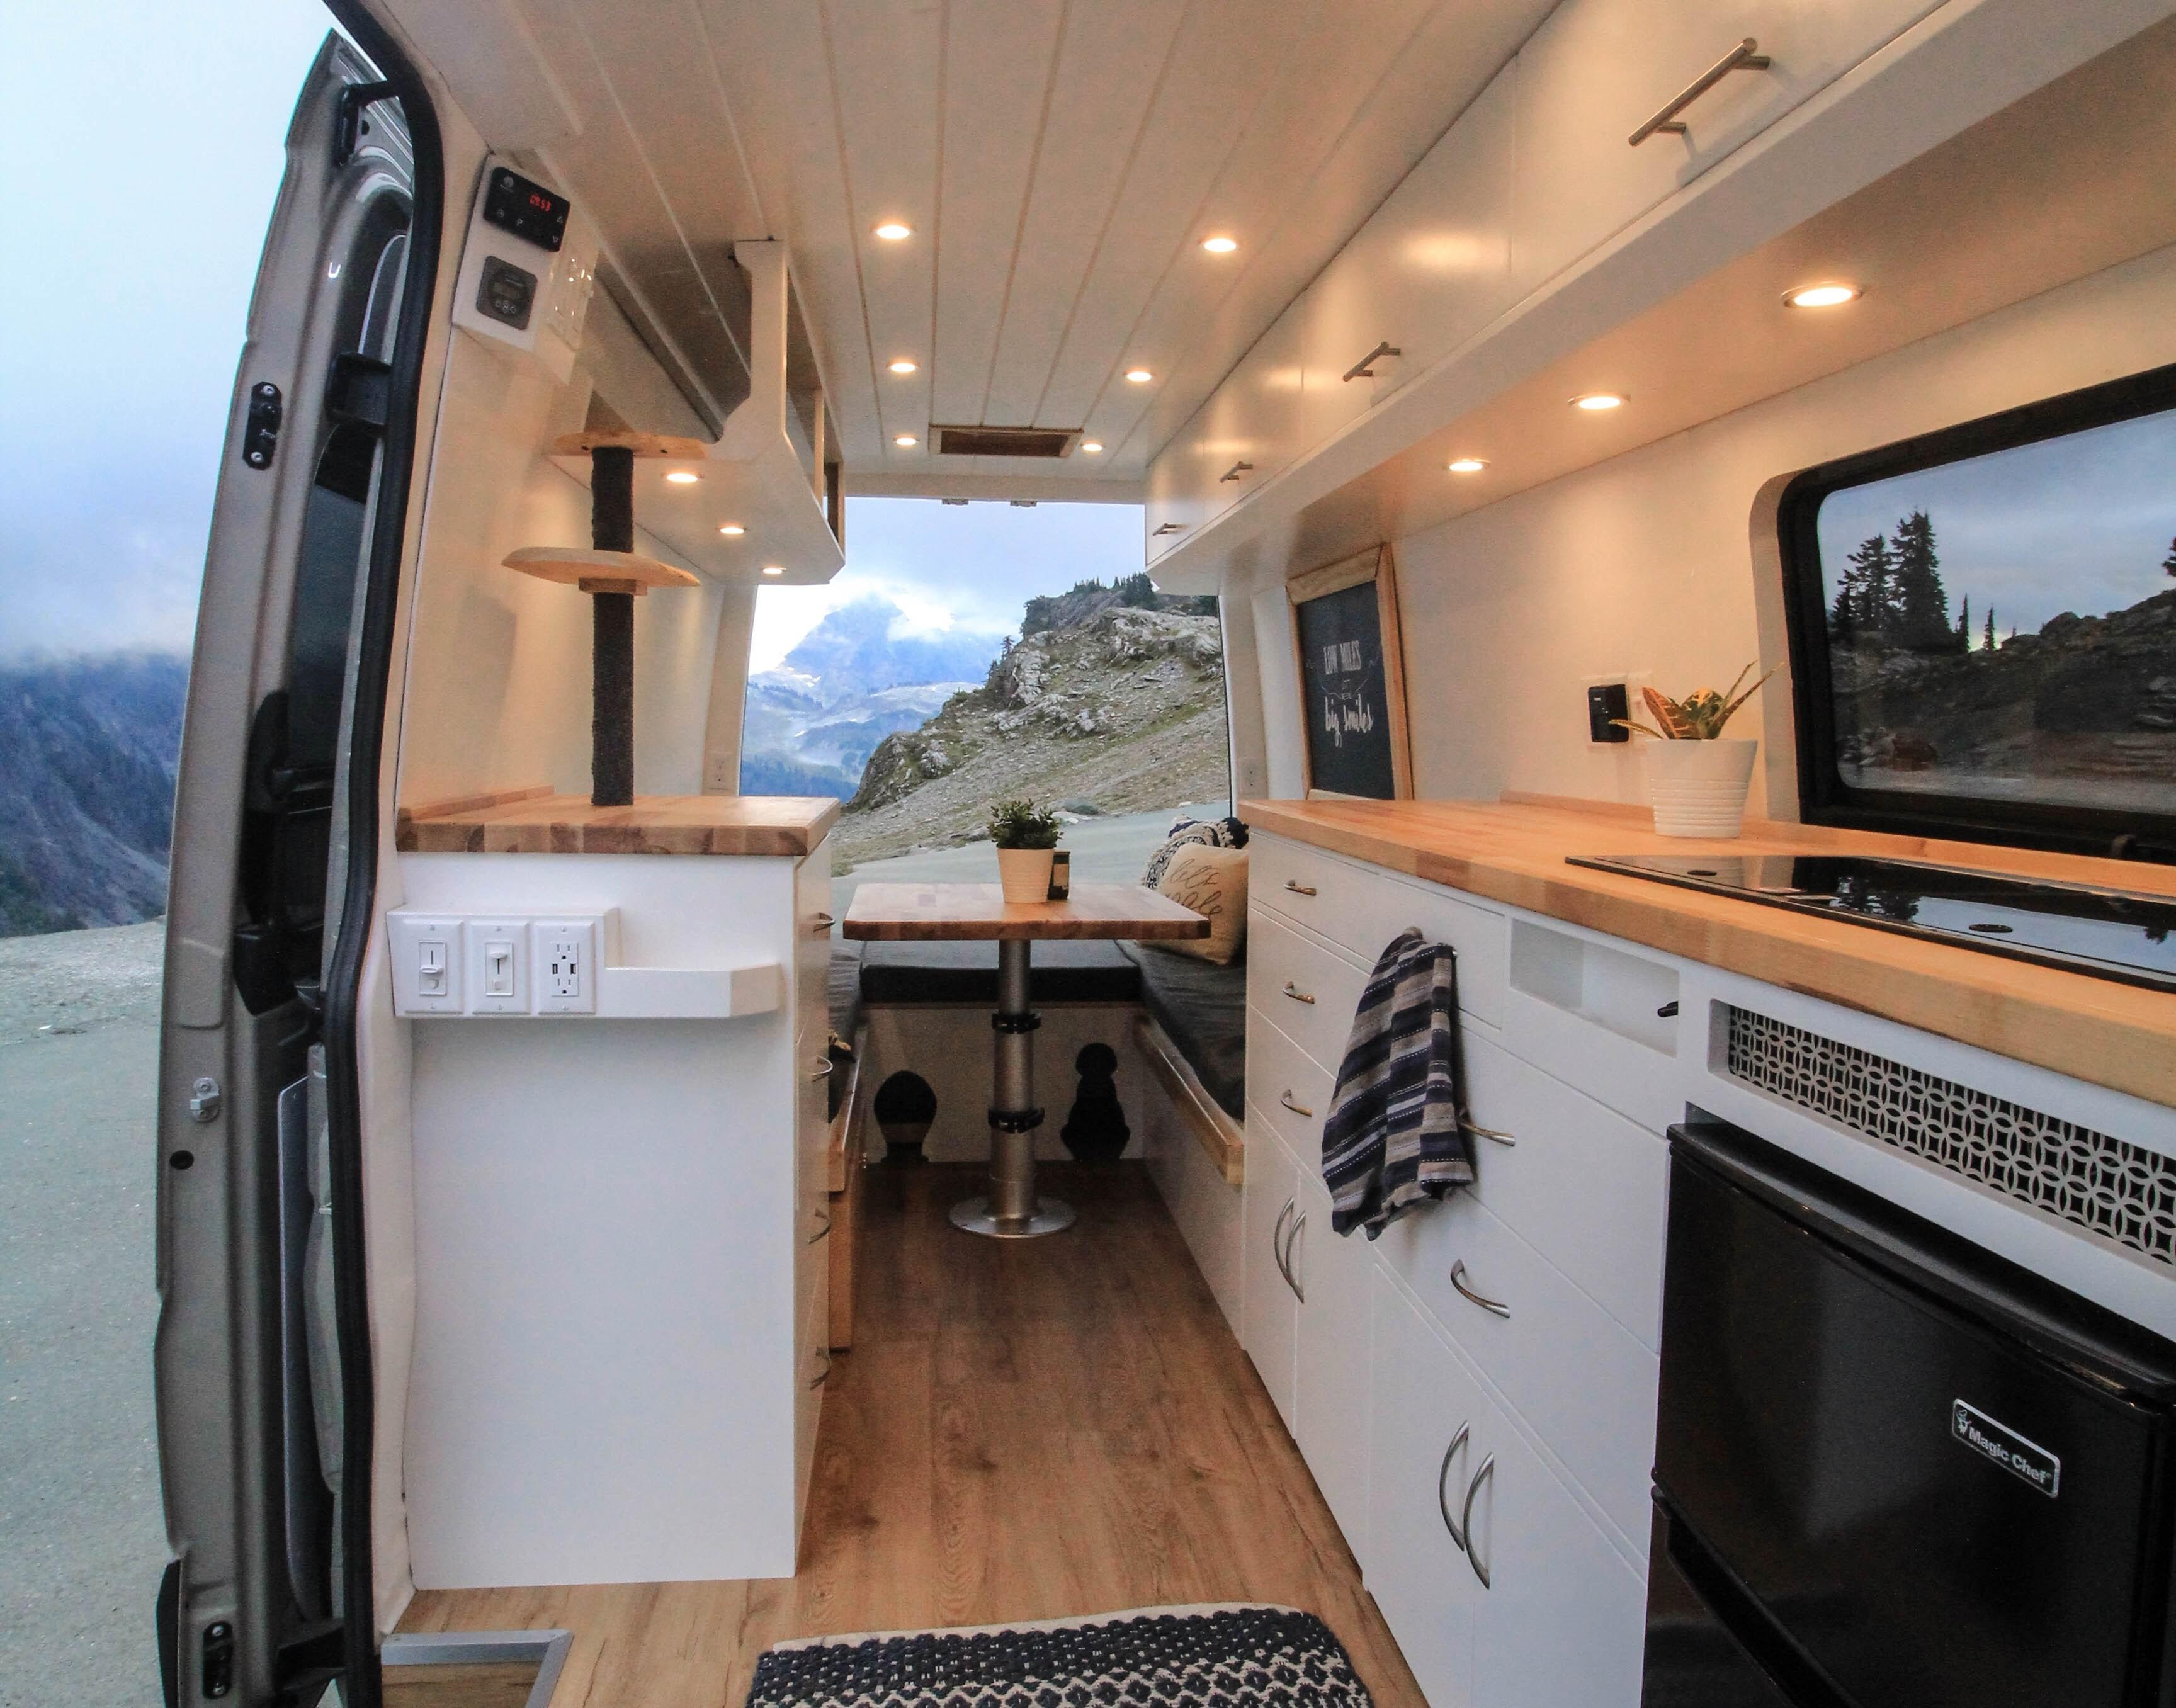 Converted camper van is a cozy home on wheels